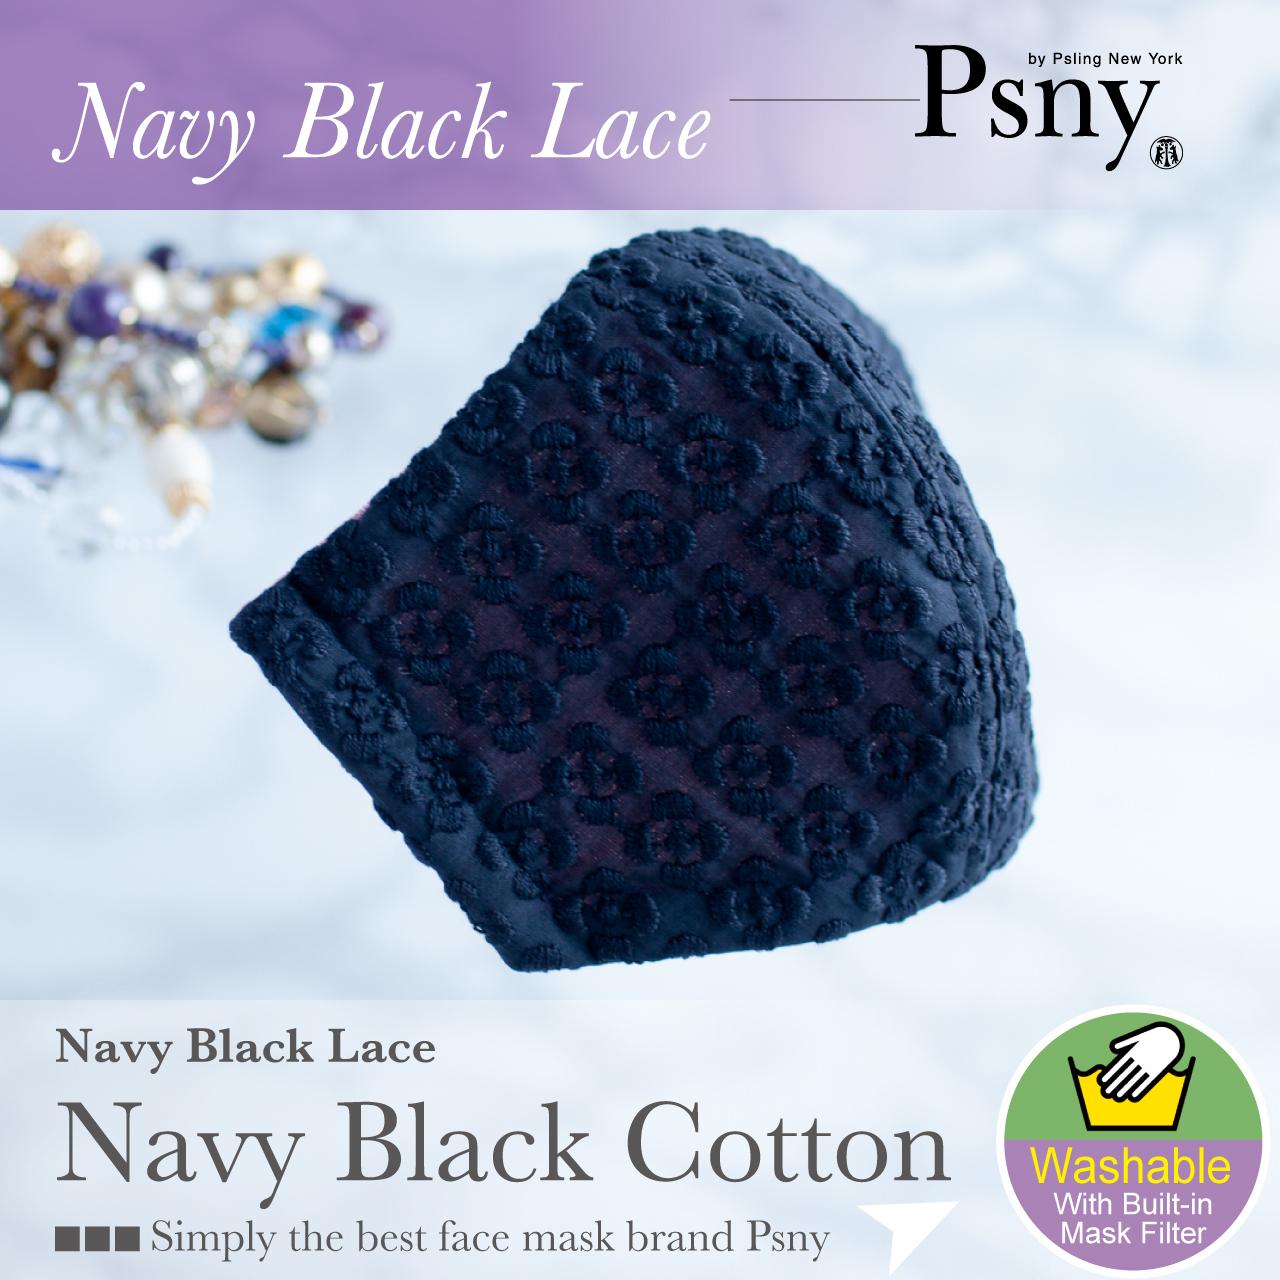 PSNY レース ネイビー・ブラック2 花粉 黄砂 不織布フィルター入り 大人用 立体 高級 美しい マスク 送料無料 L40